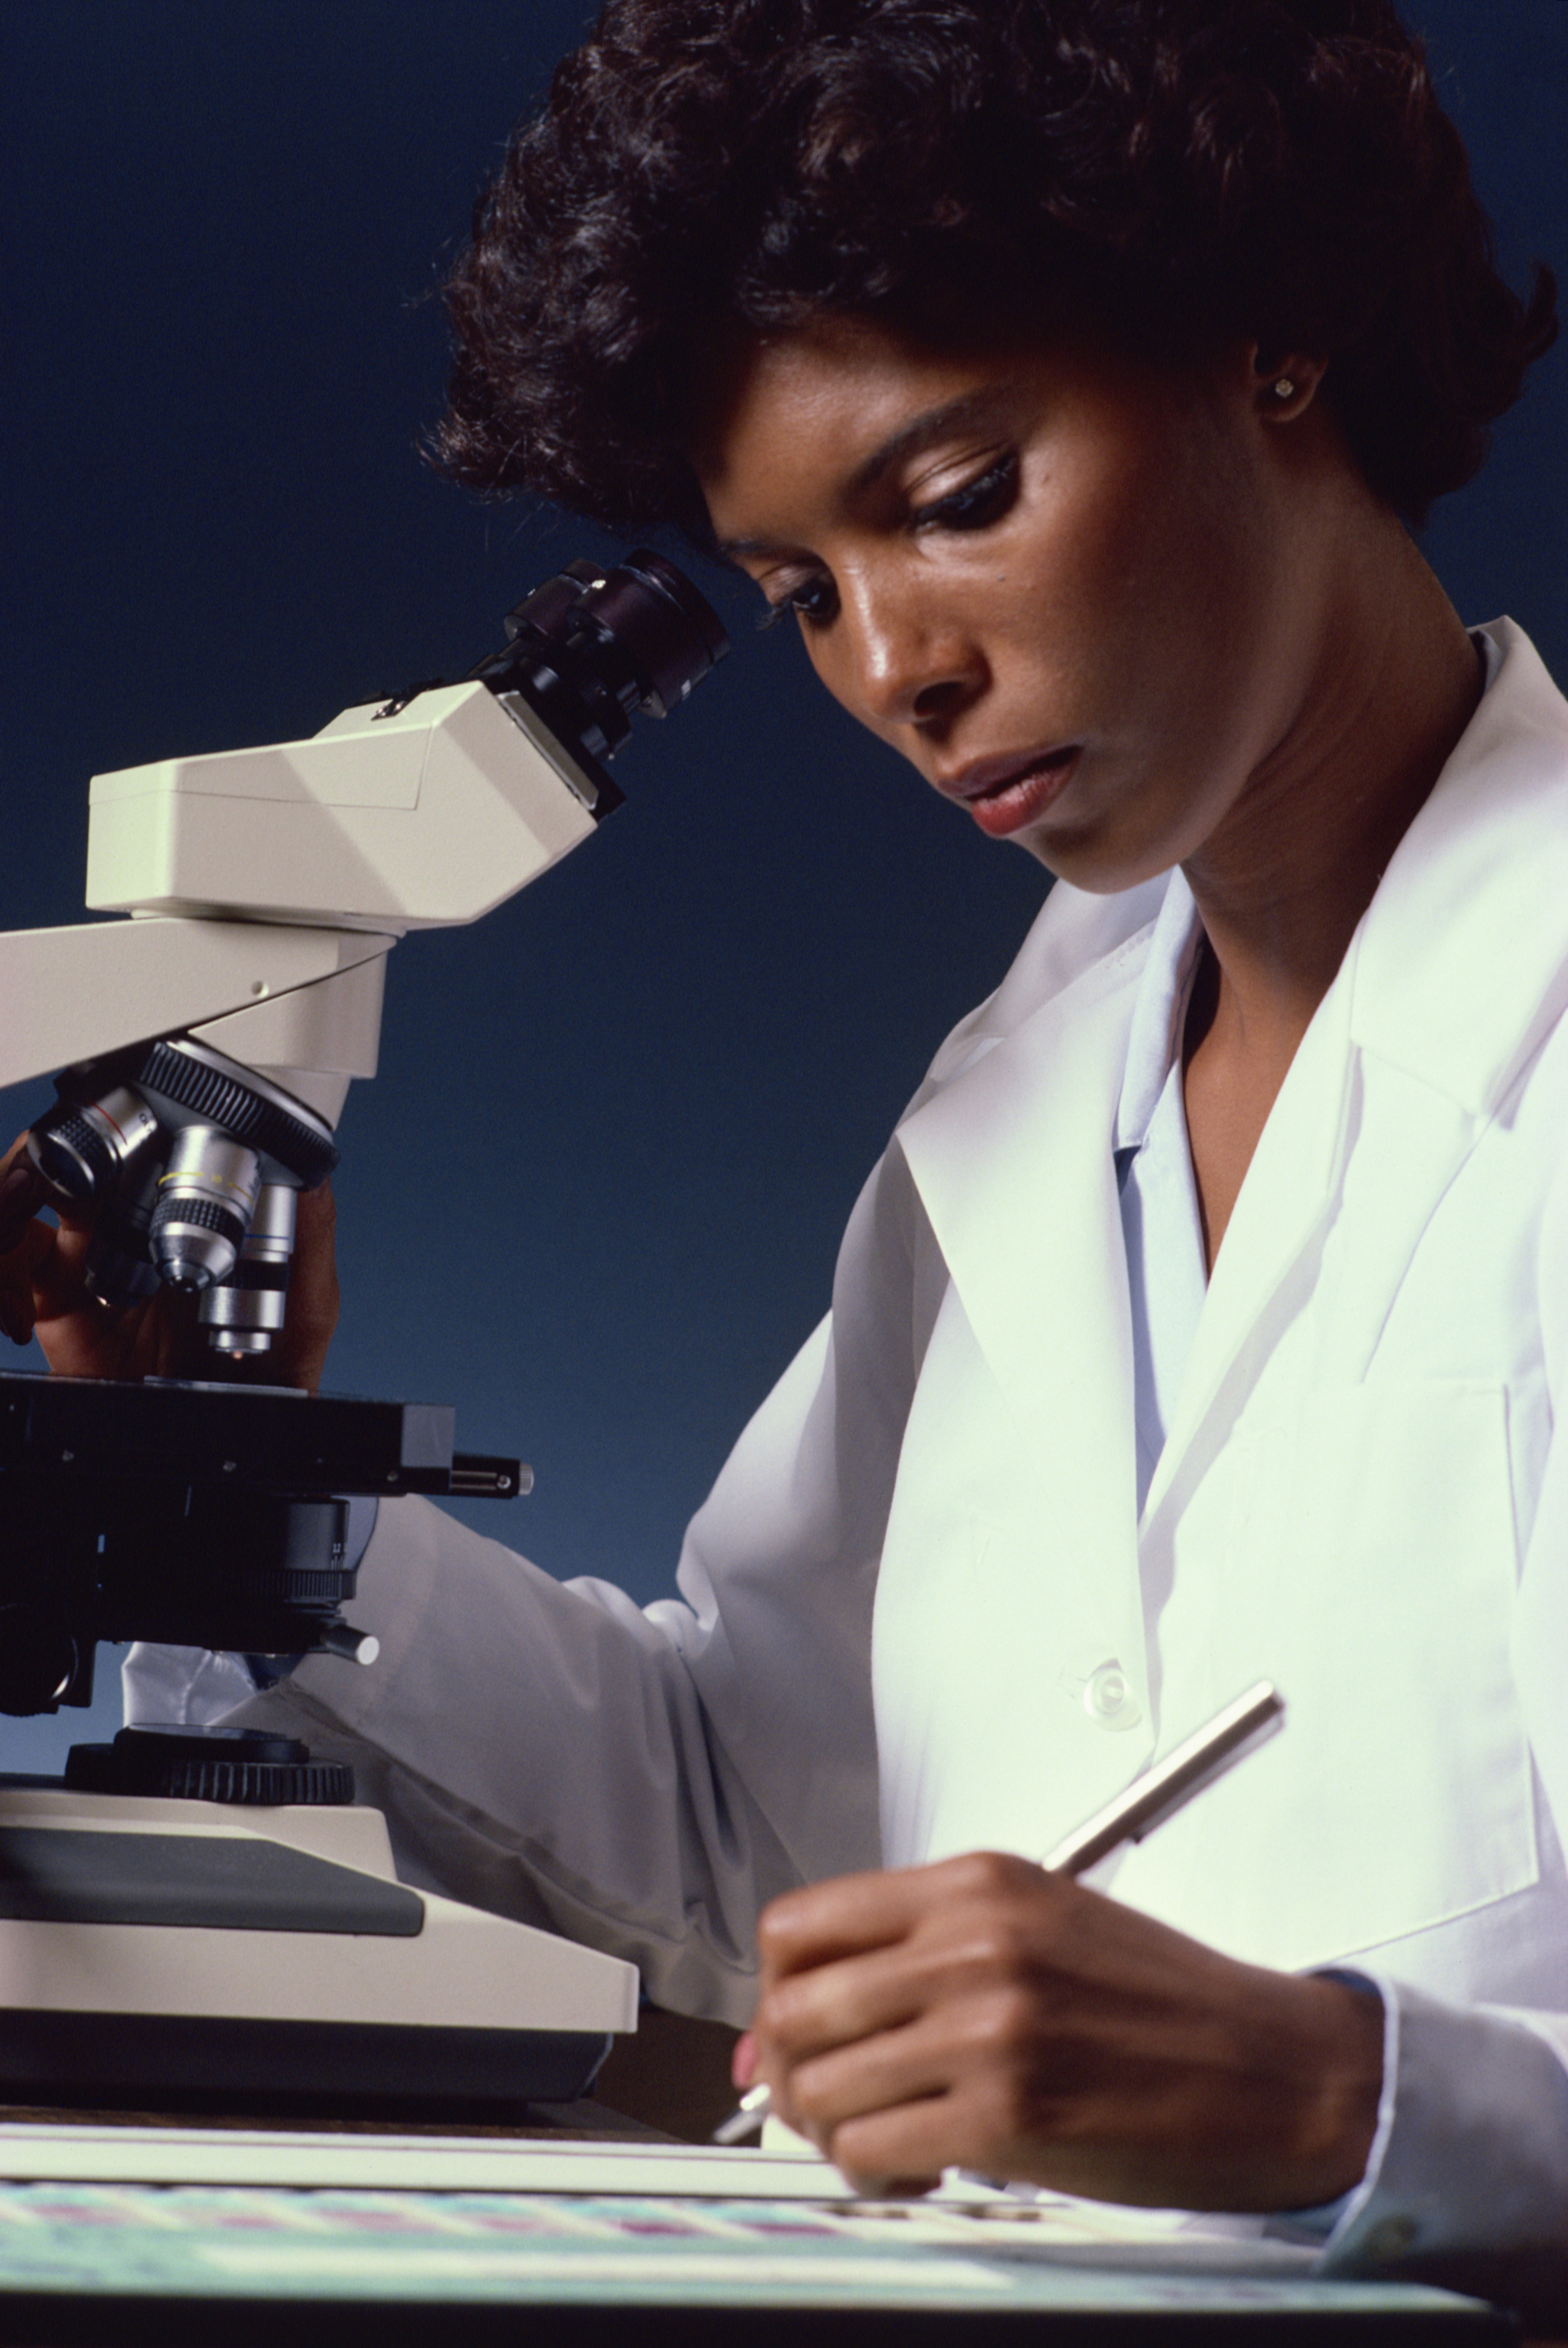 histology technician job description